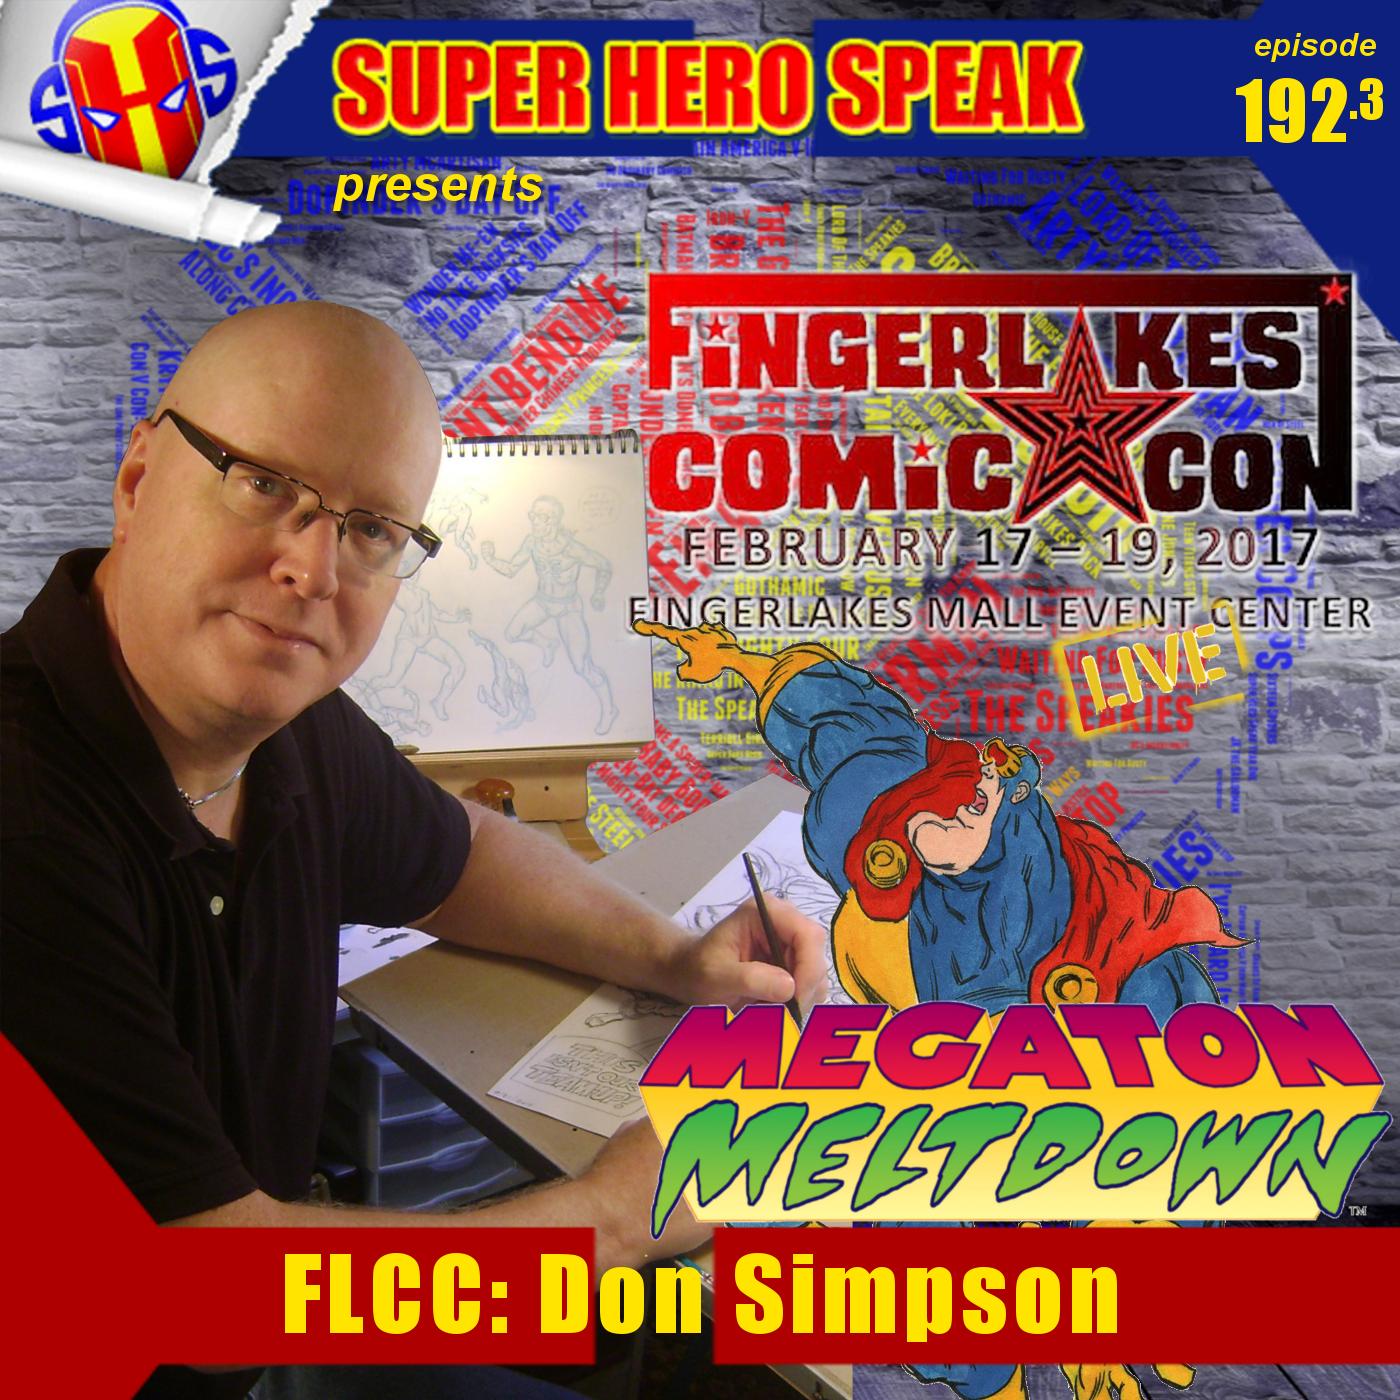 #192.3: FLCC Don Simpson